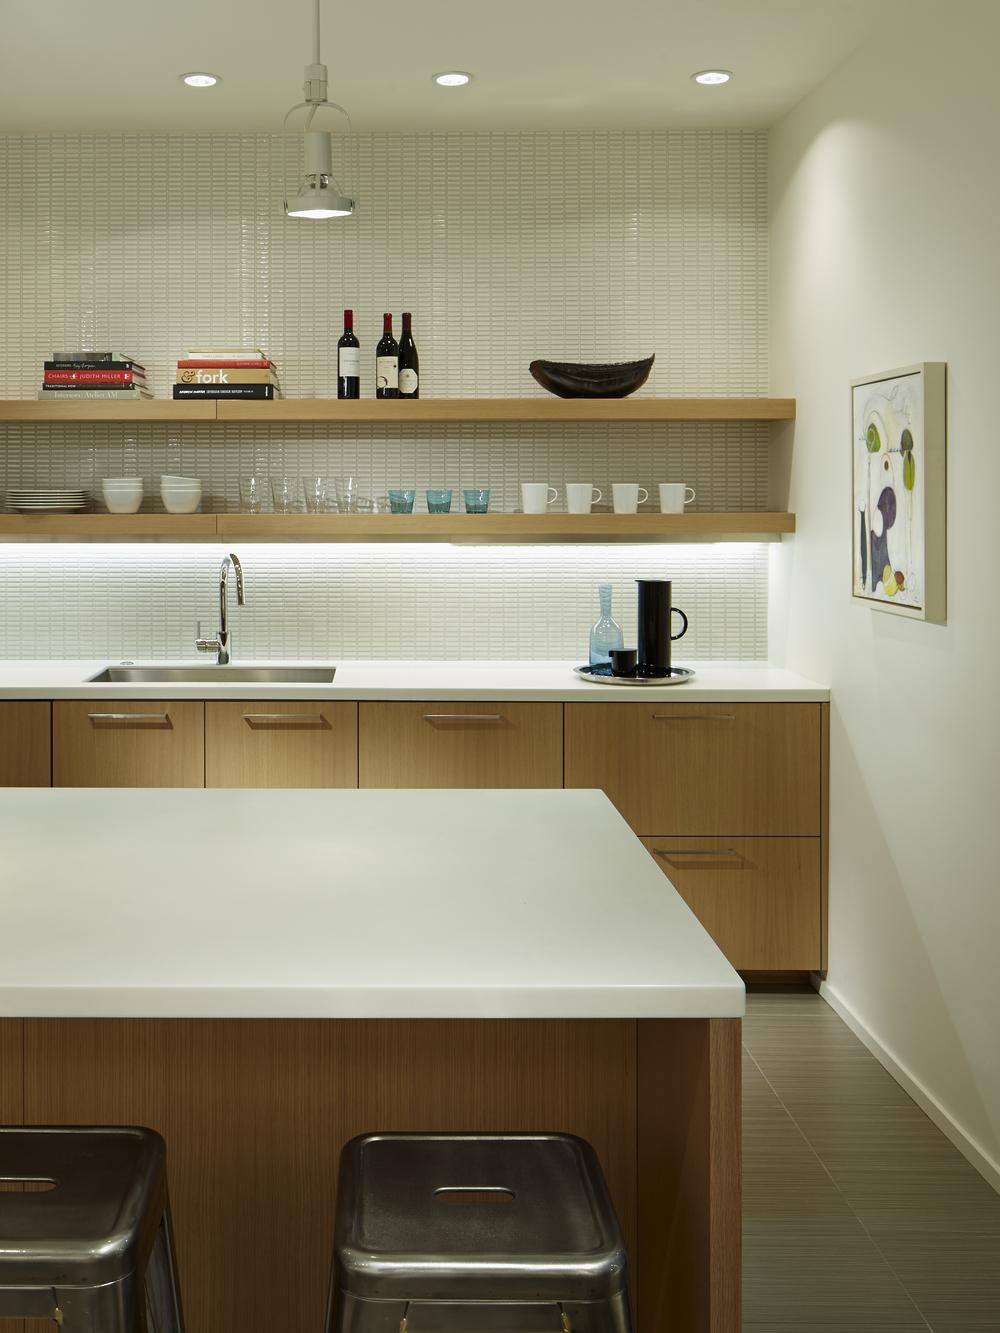 Kadlec Architecture + Design - KA+D Studio 8.jpg